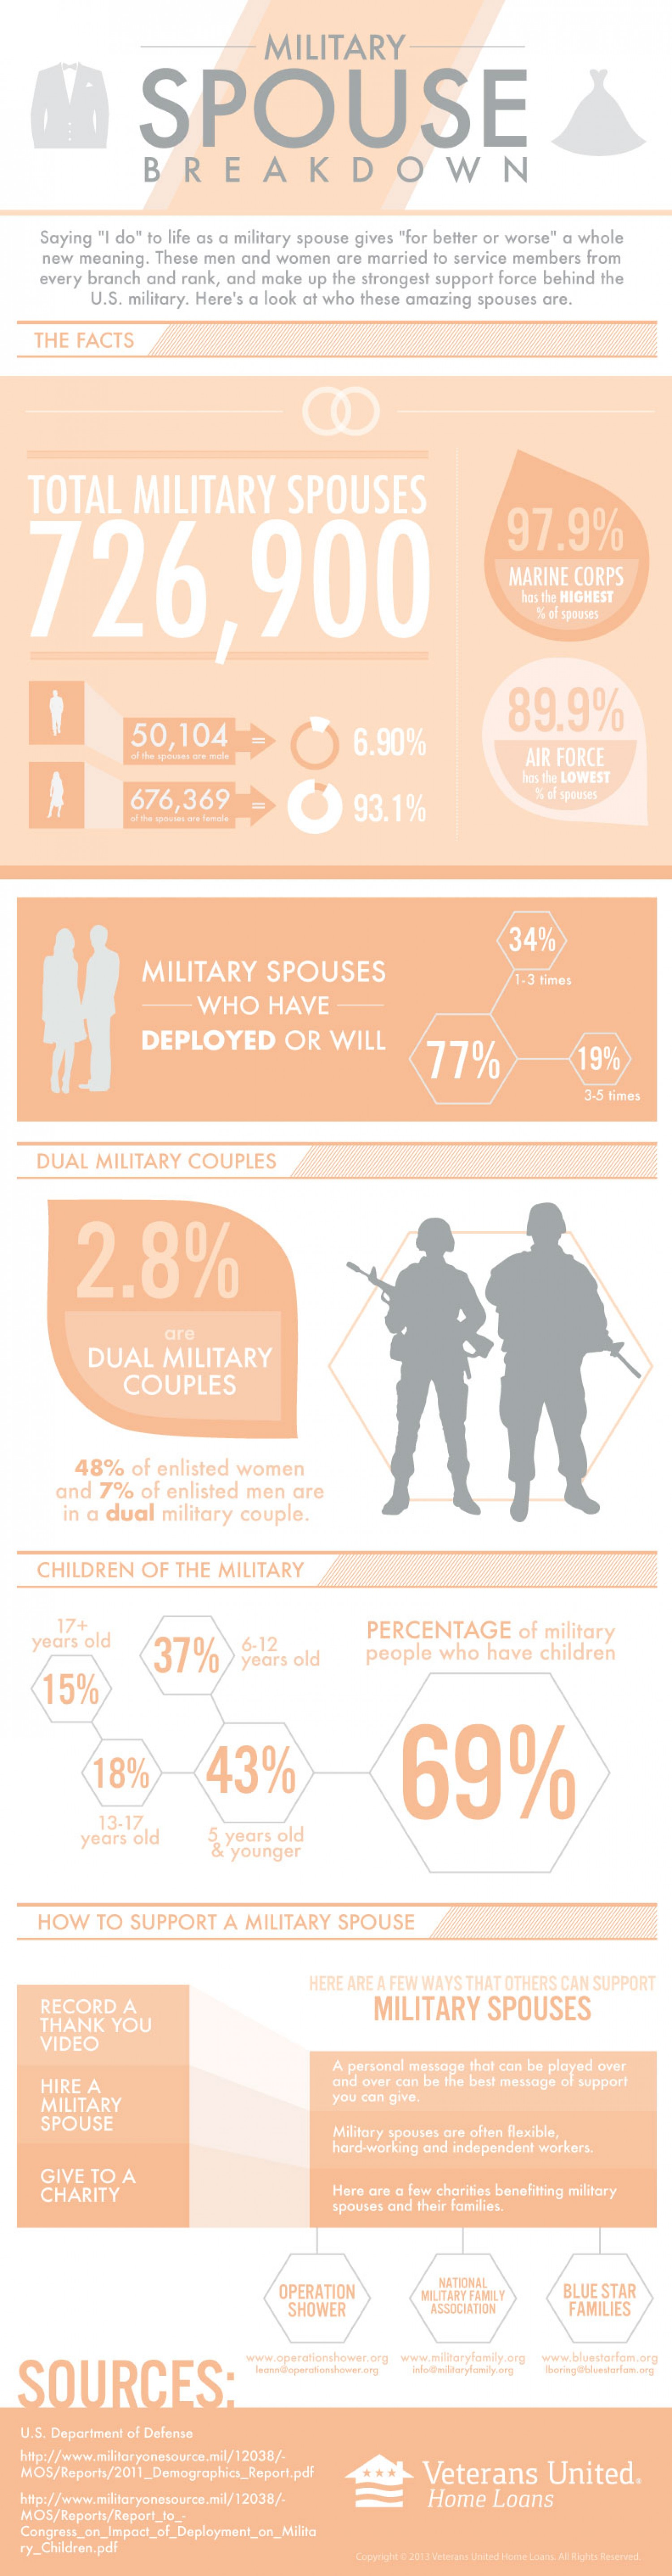 7. Military spouse breakdown